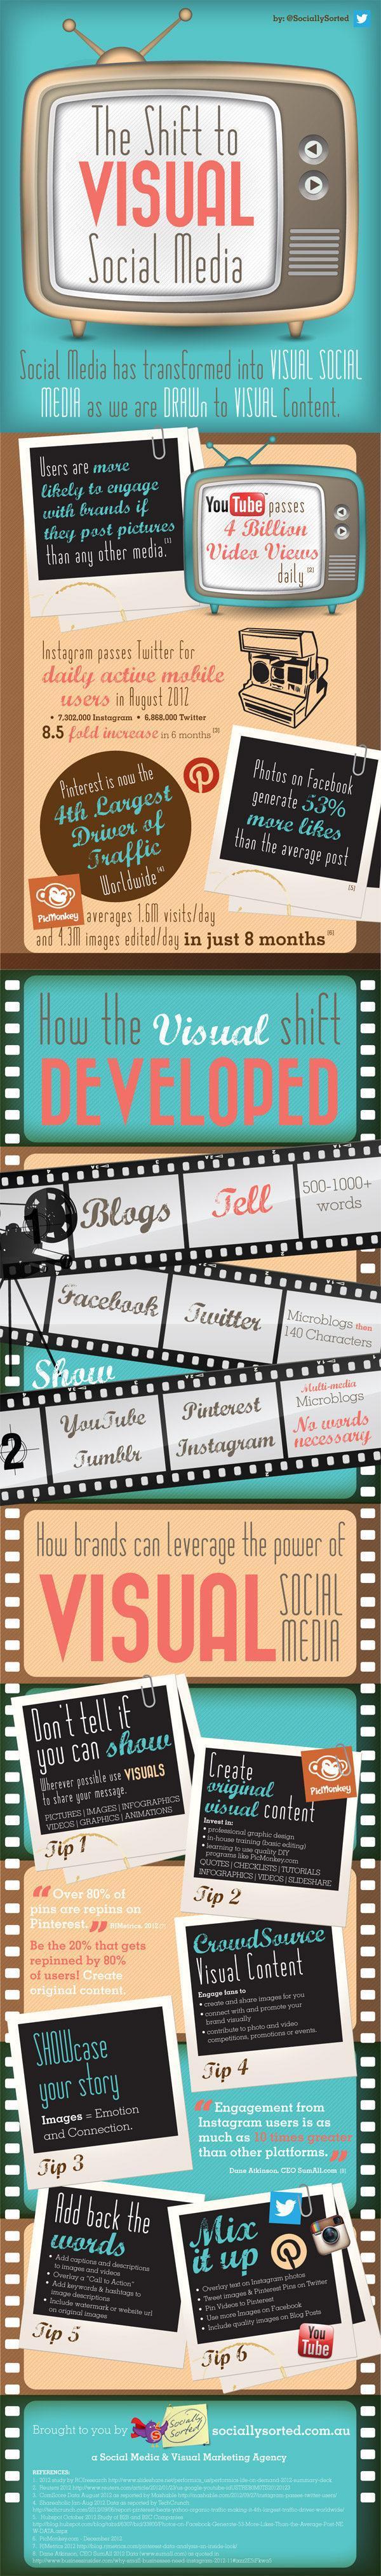 Shift-to-Visual-Social-Media